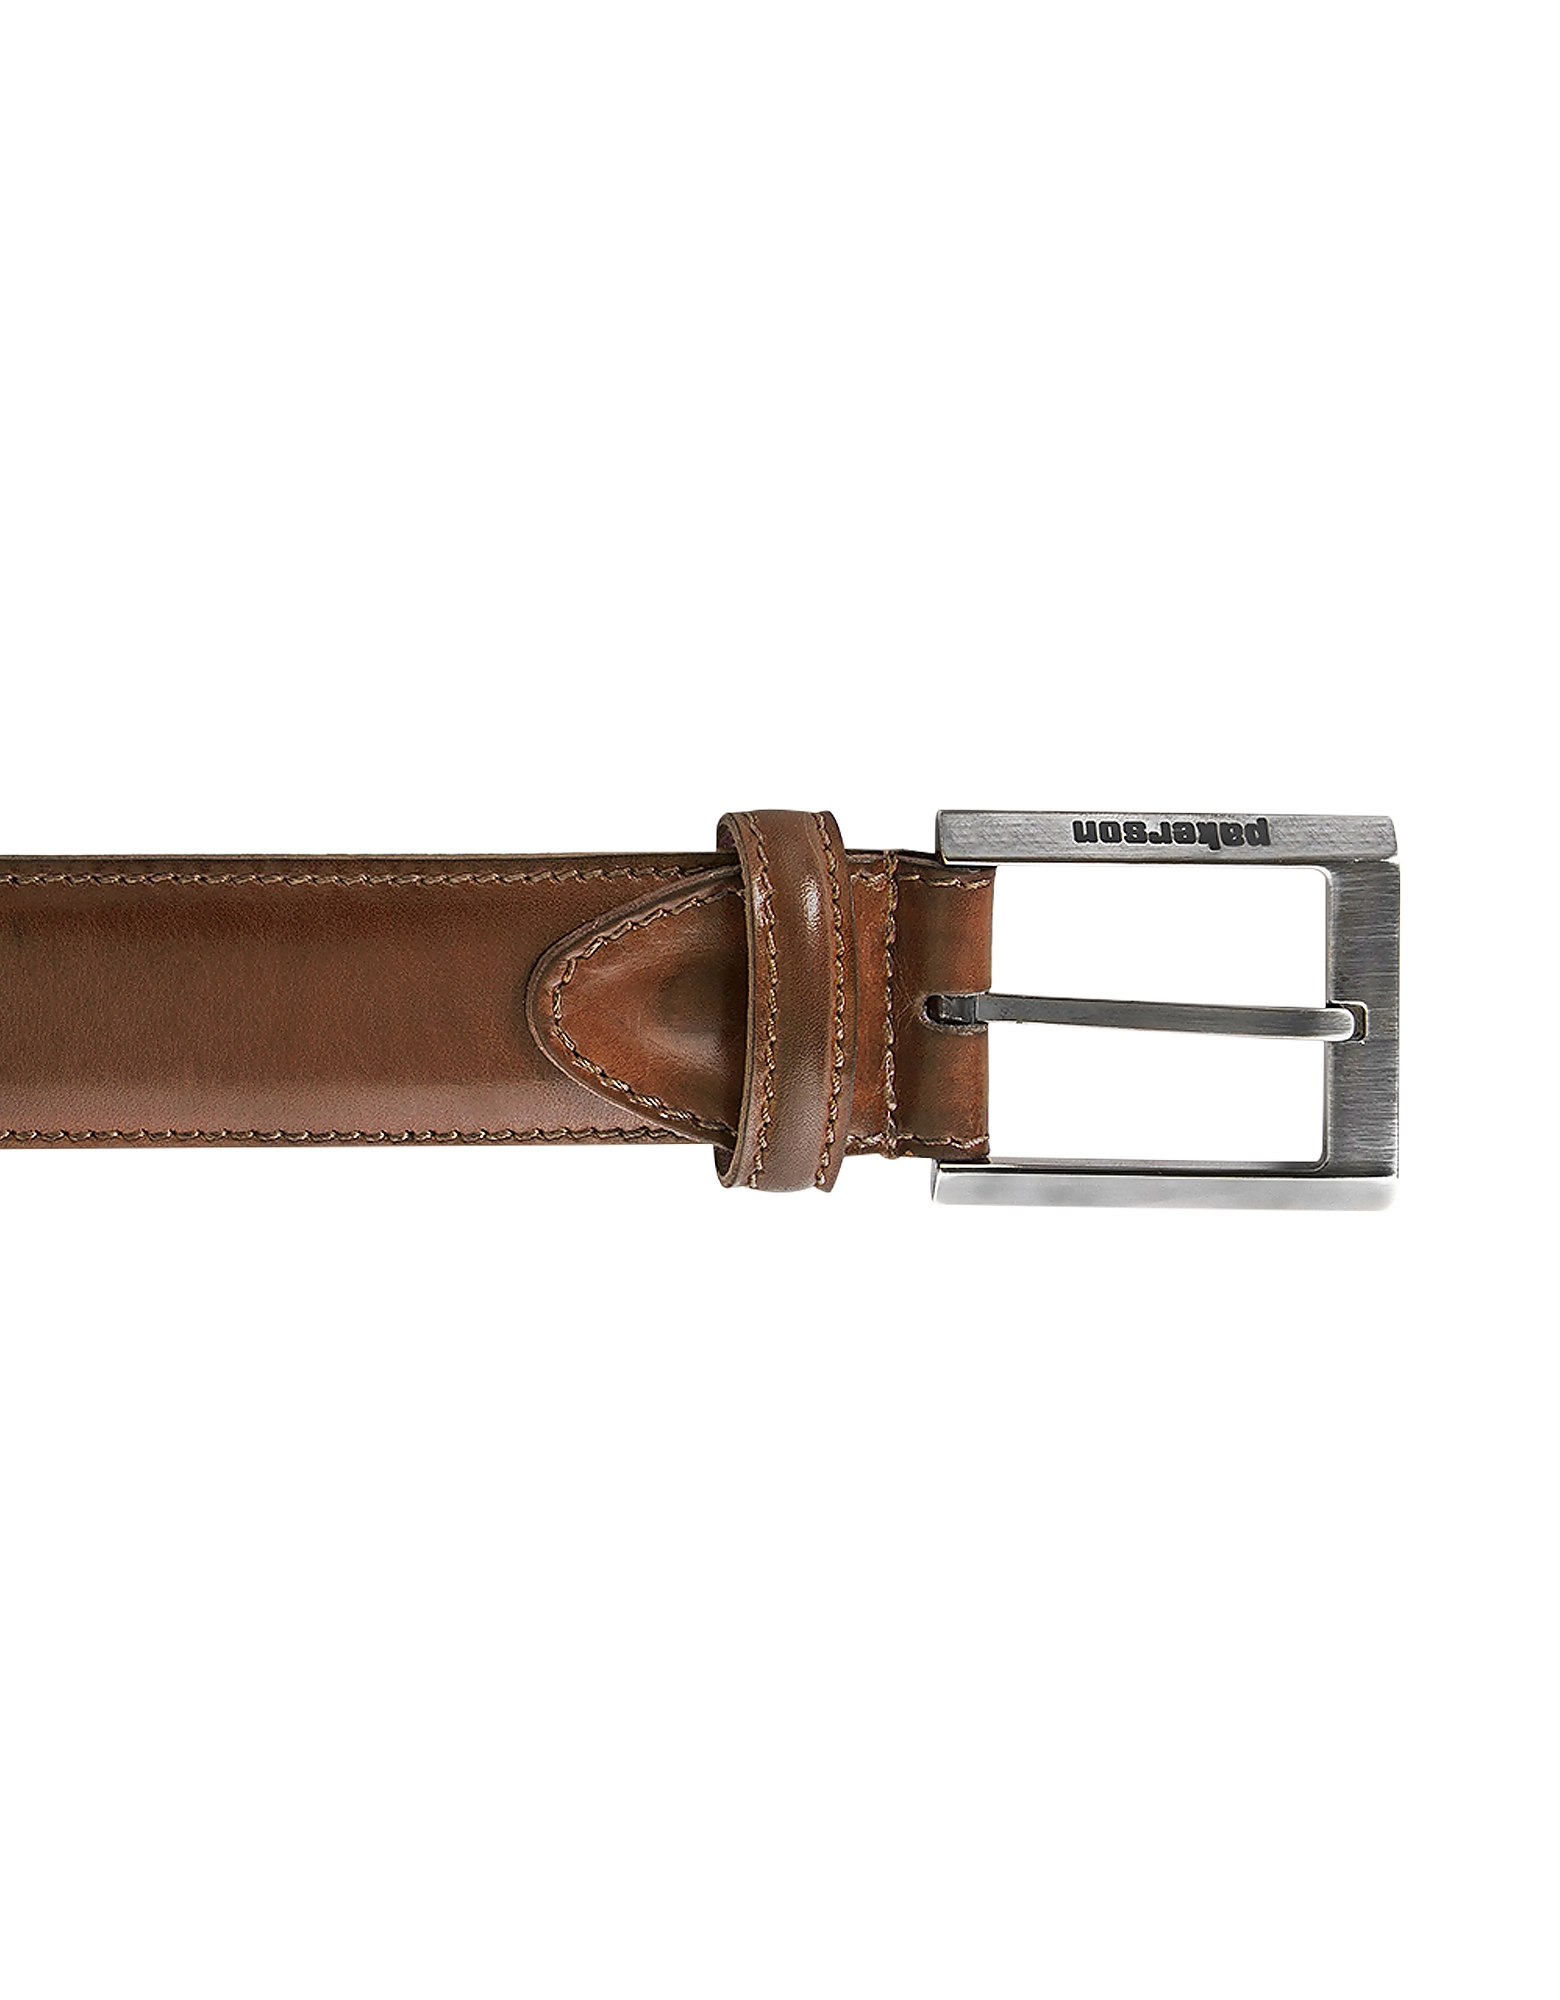 Pakerson Designer Men's Belts, Volterra Cocoa Handmade Italian Leather Belt